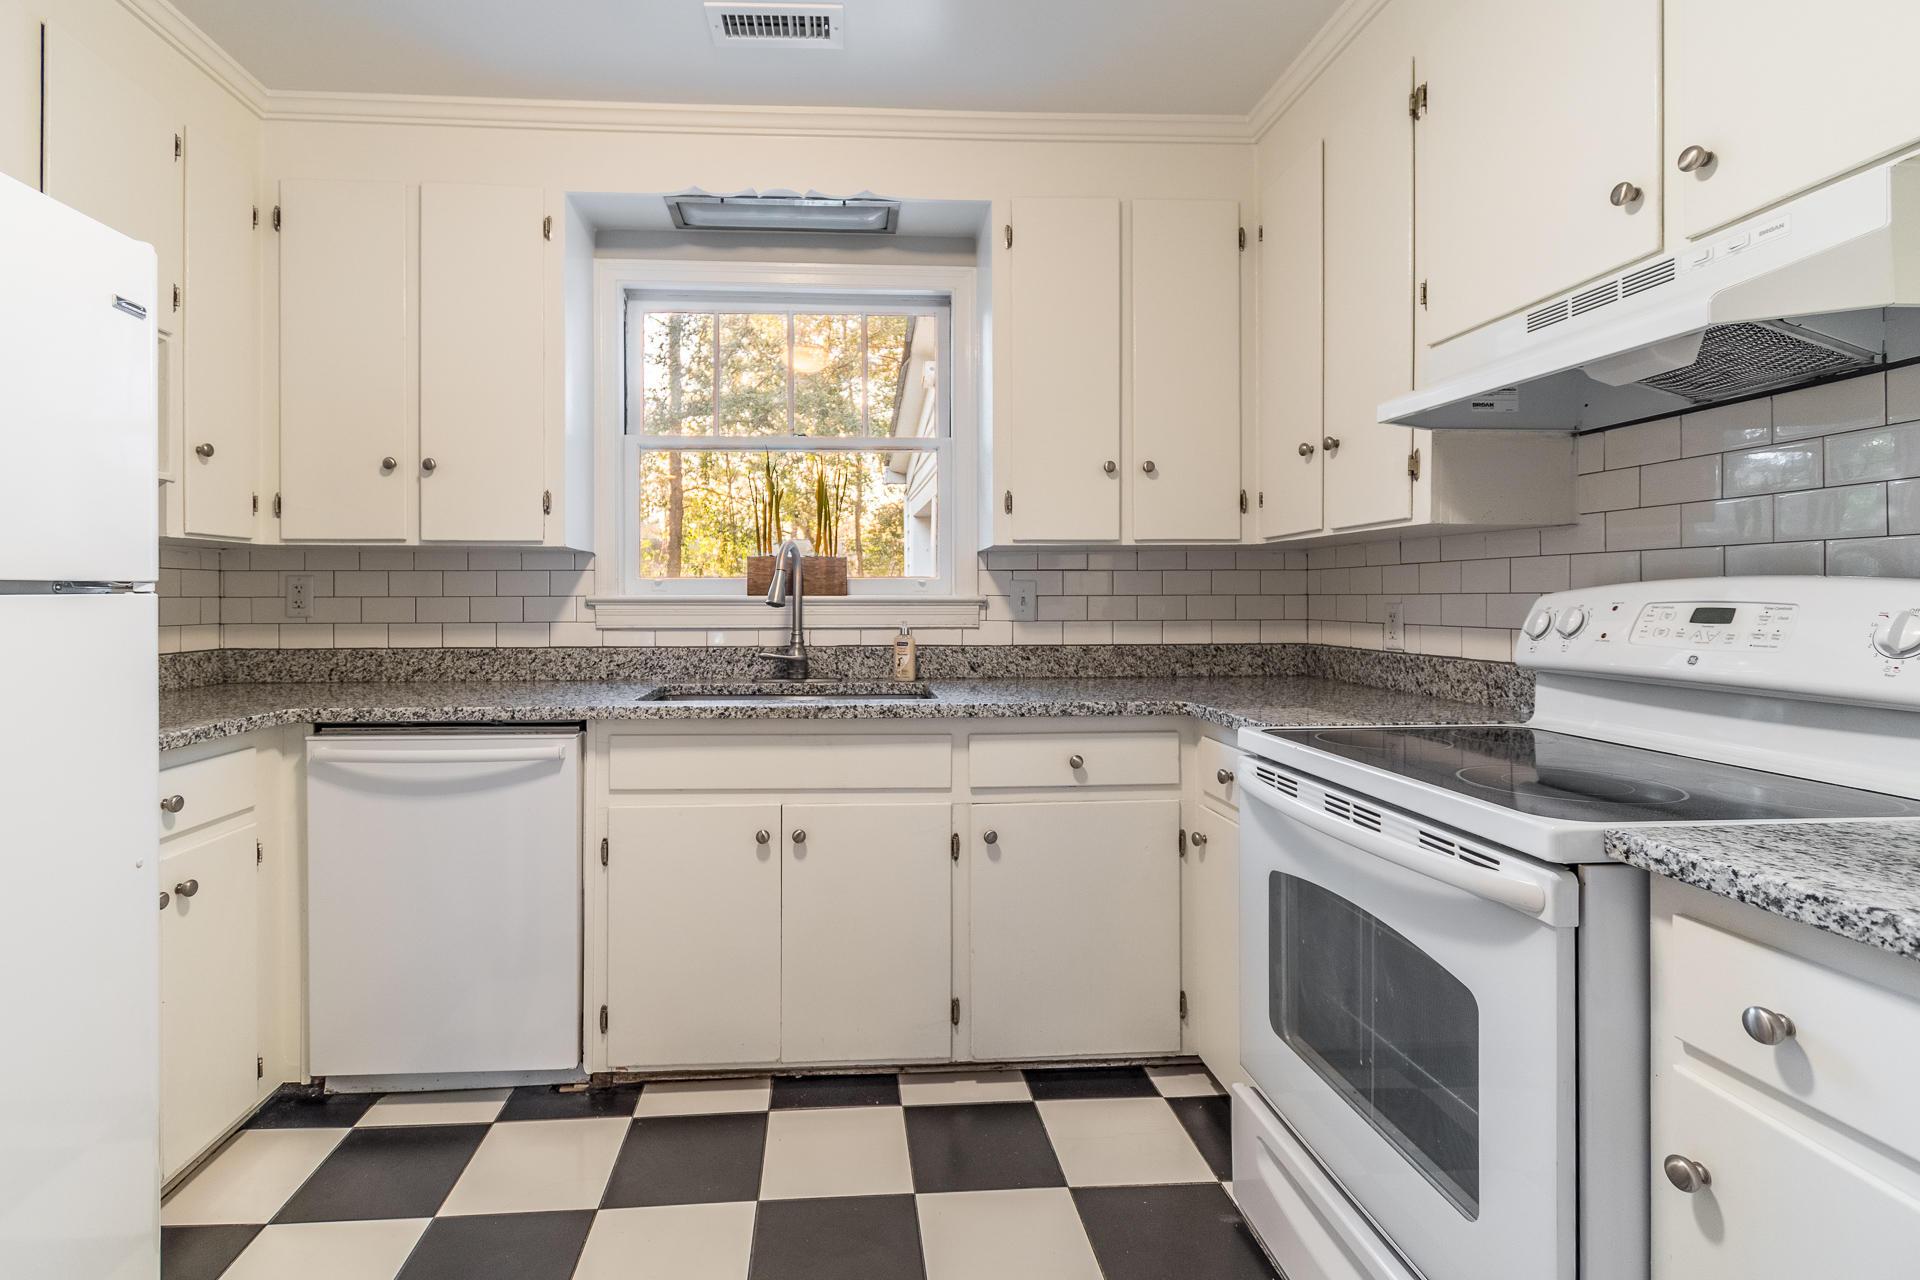 Edgewood Gardens Homes For Sale - 507 Risher, Charleston, SC - 15